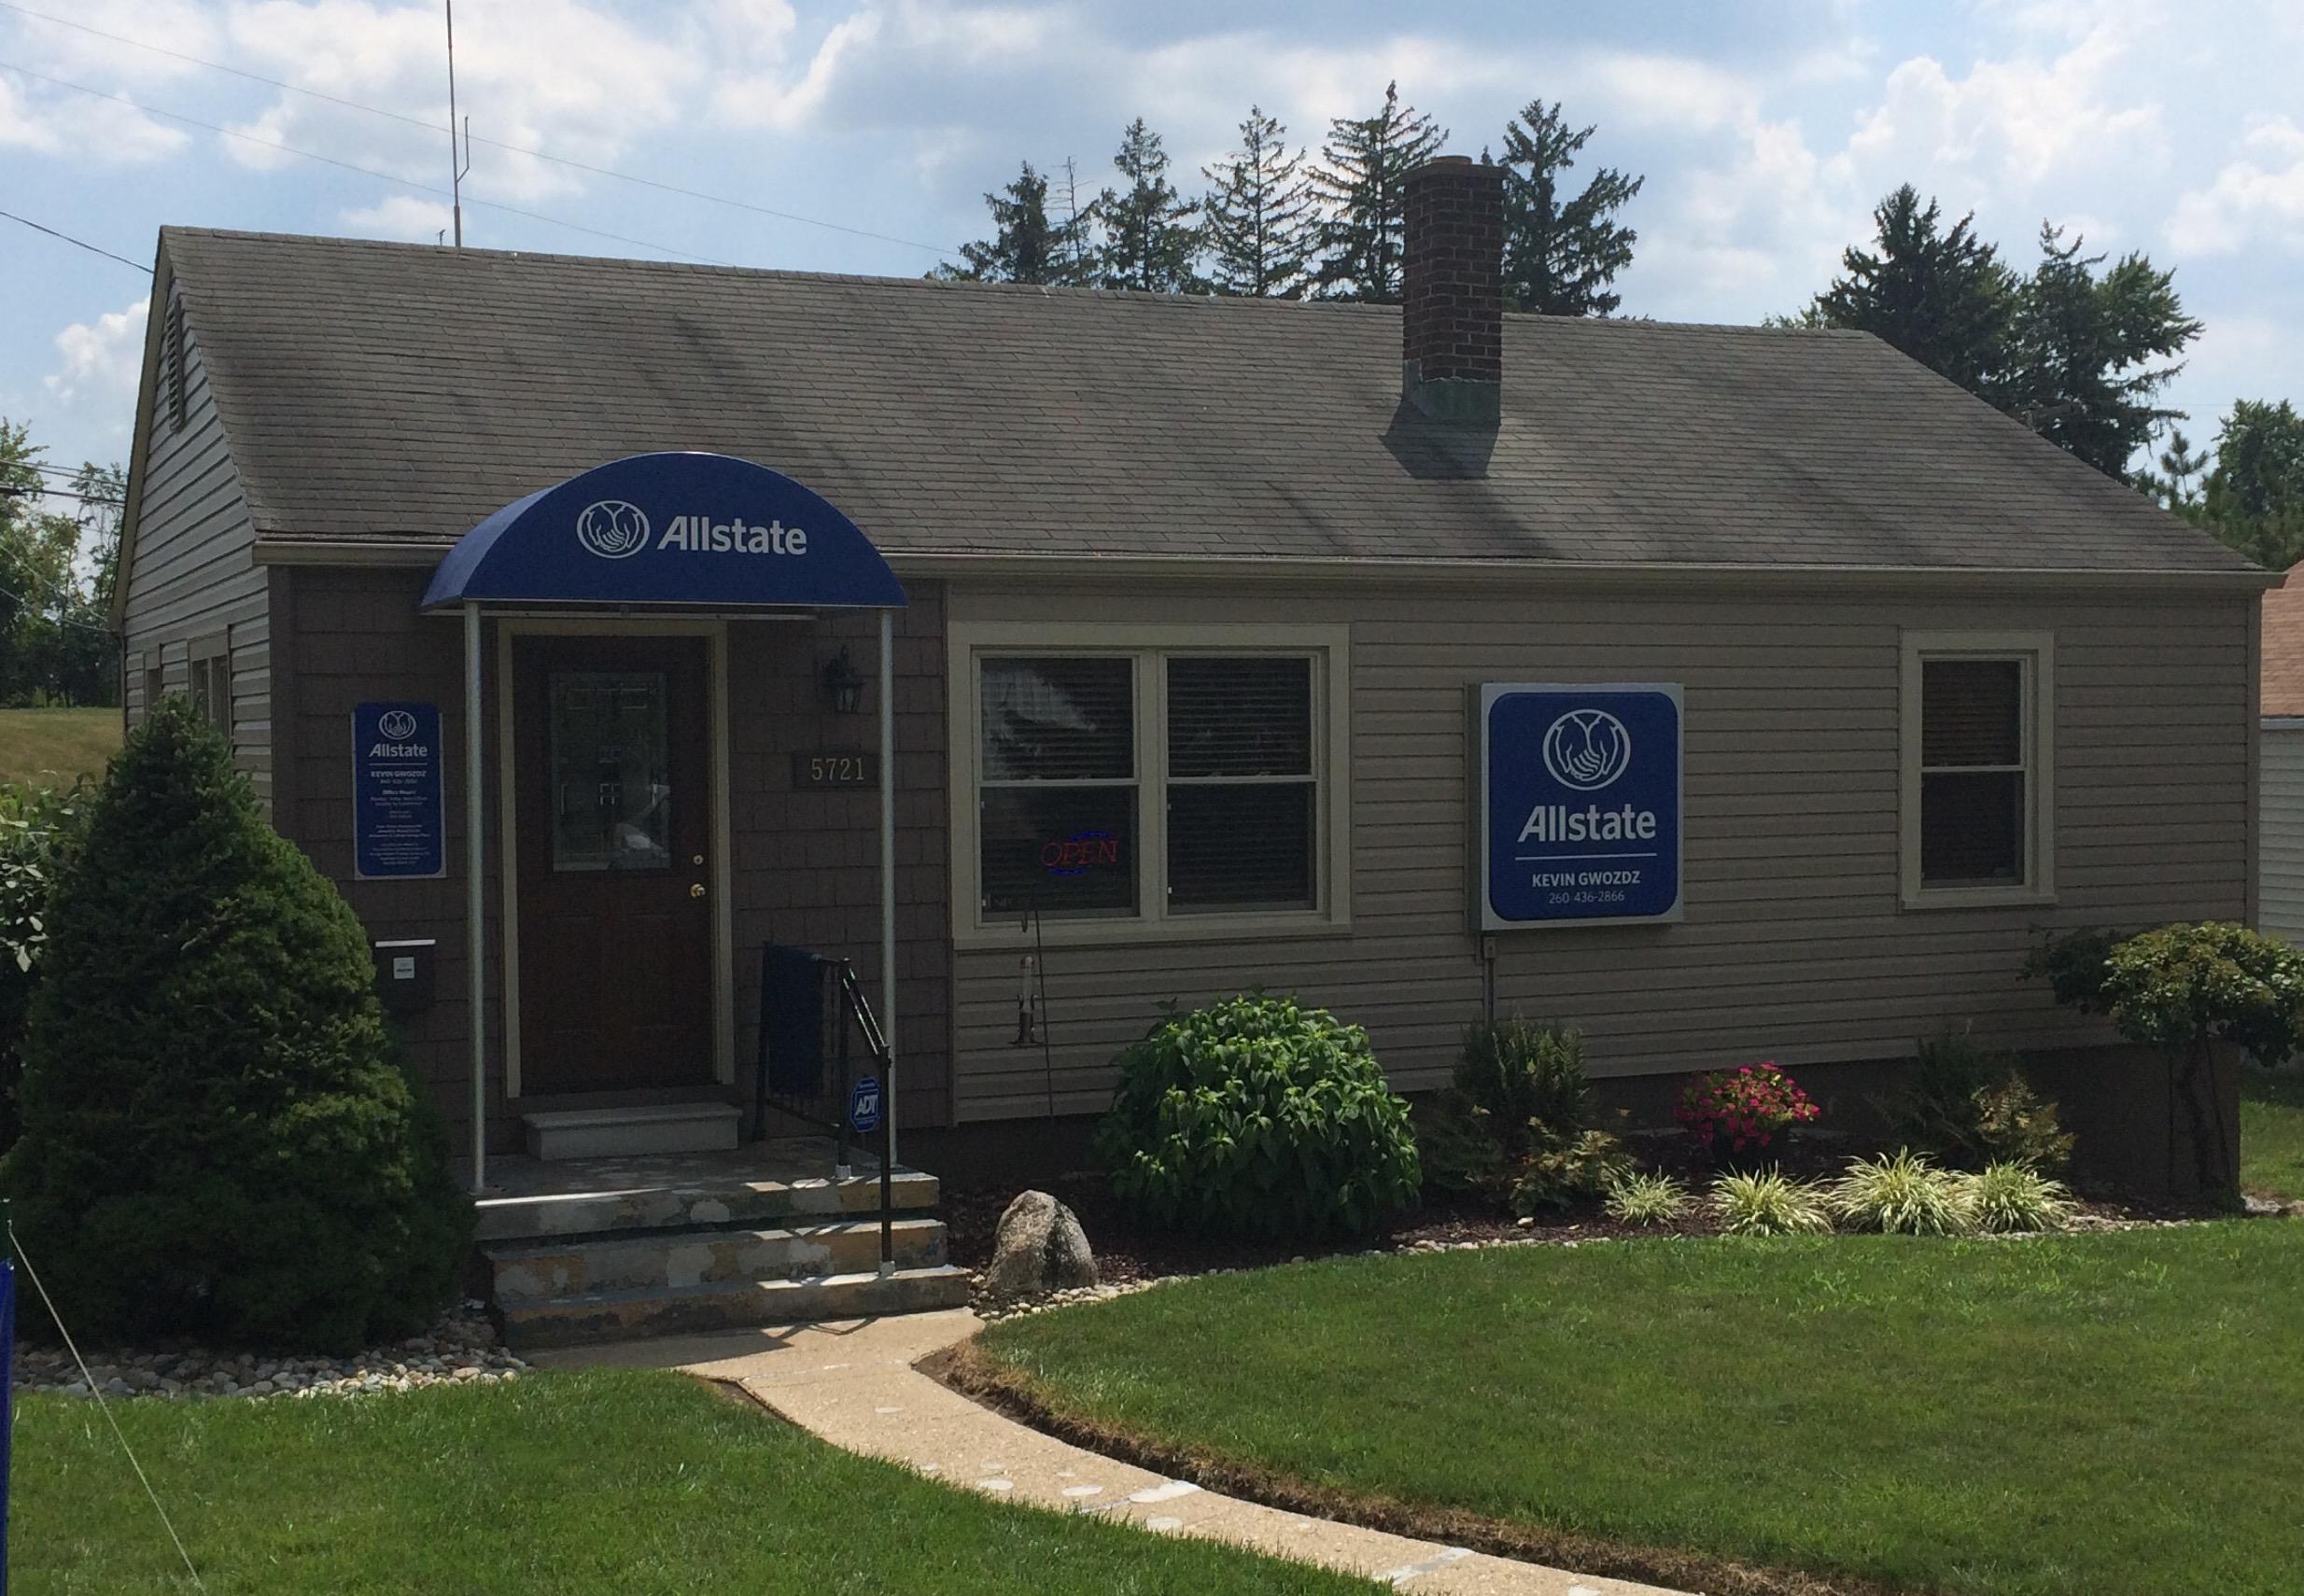 Kevin Gwozdz: Allstate Insurance image 1